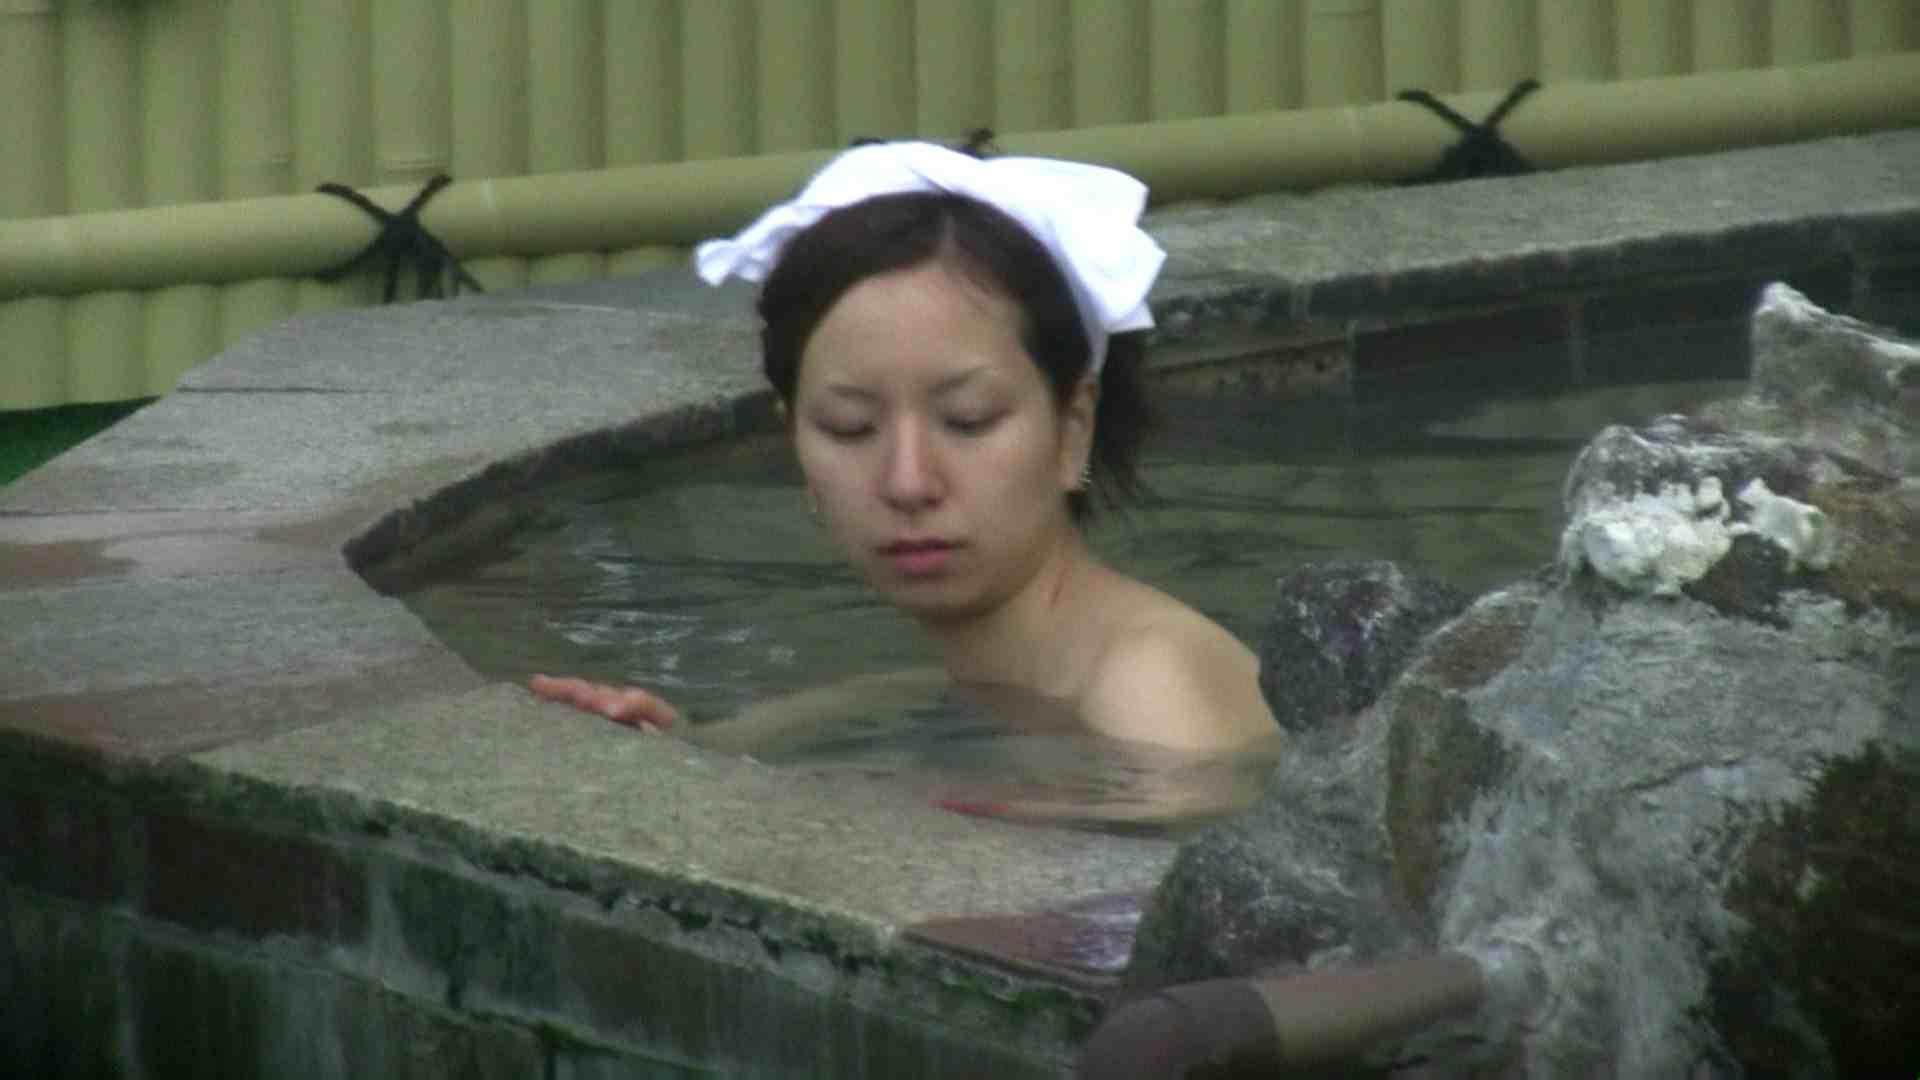 Aquaな露天風呂Vol.39【VIP】 盗撮シリーズ   露天風呂編  85PIX 1